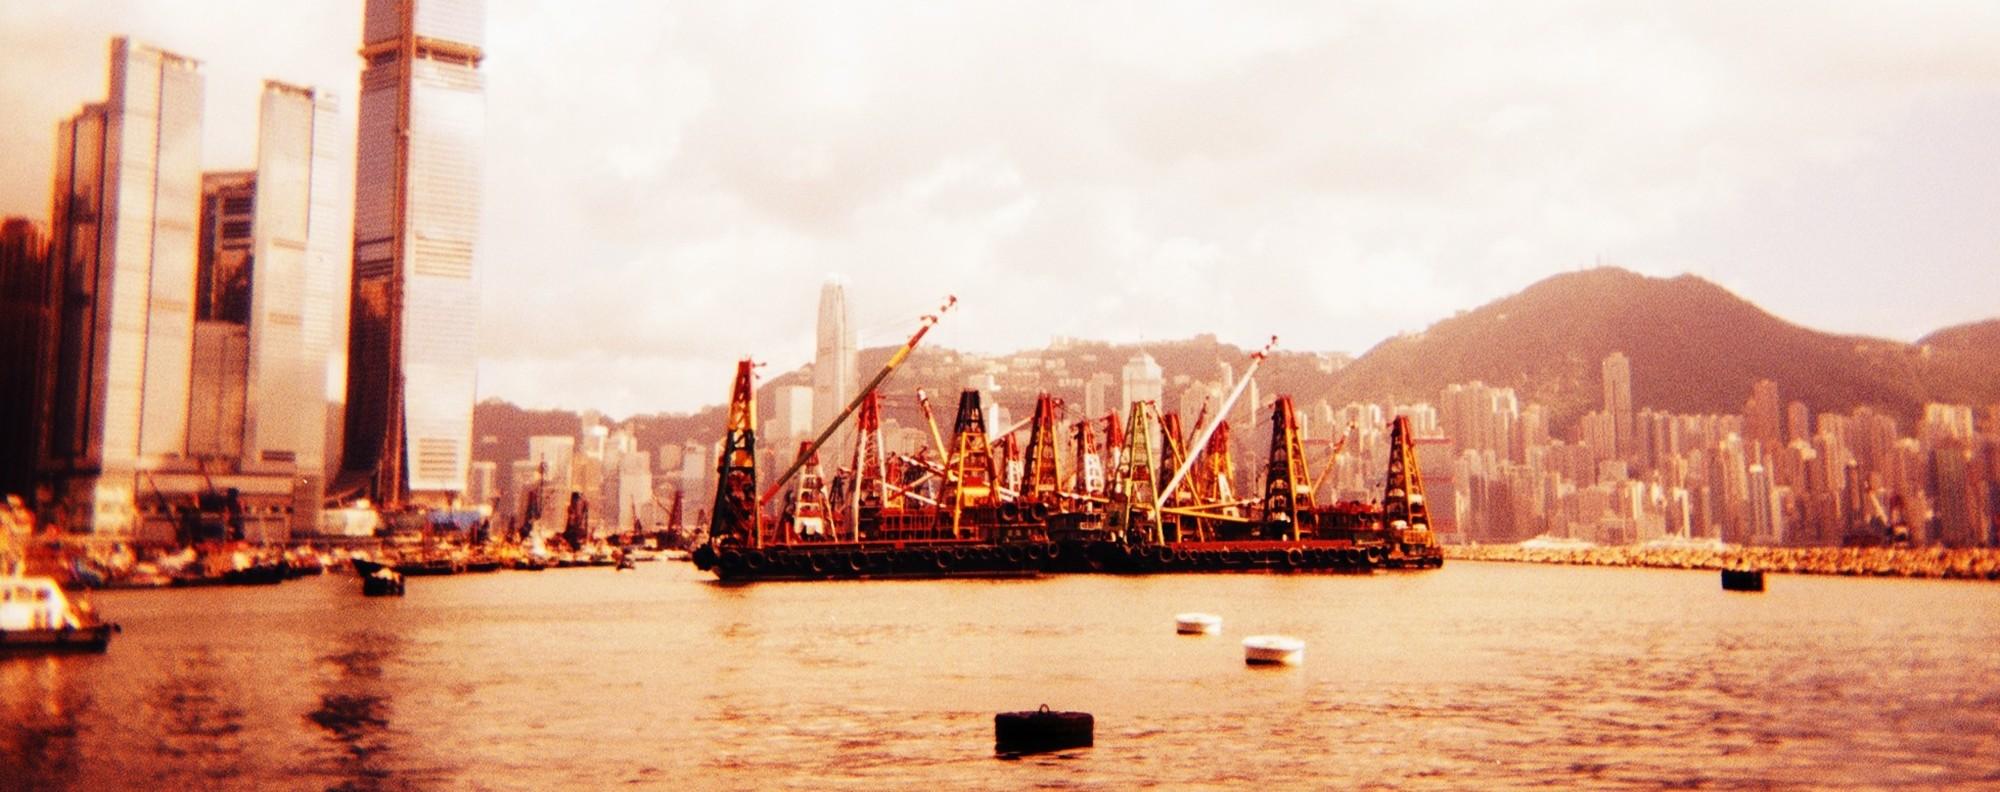 Victoria Harbour shot using a Holga camera. Picture: Justin Lim